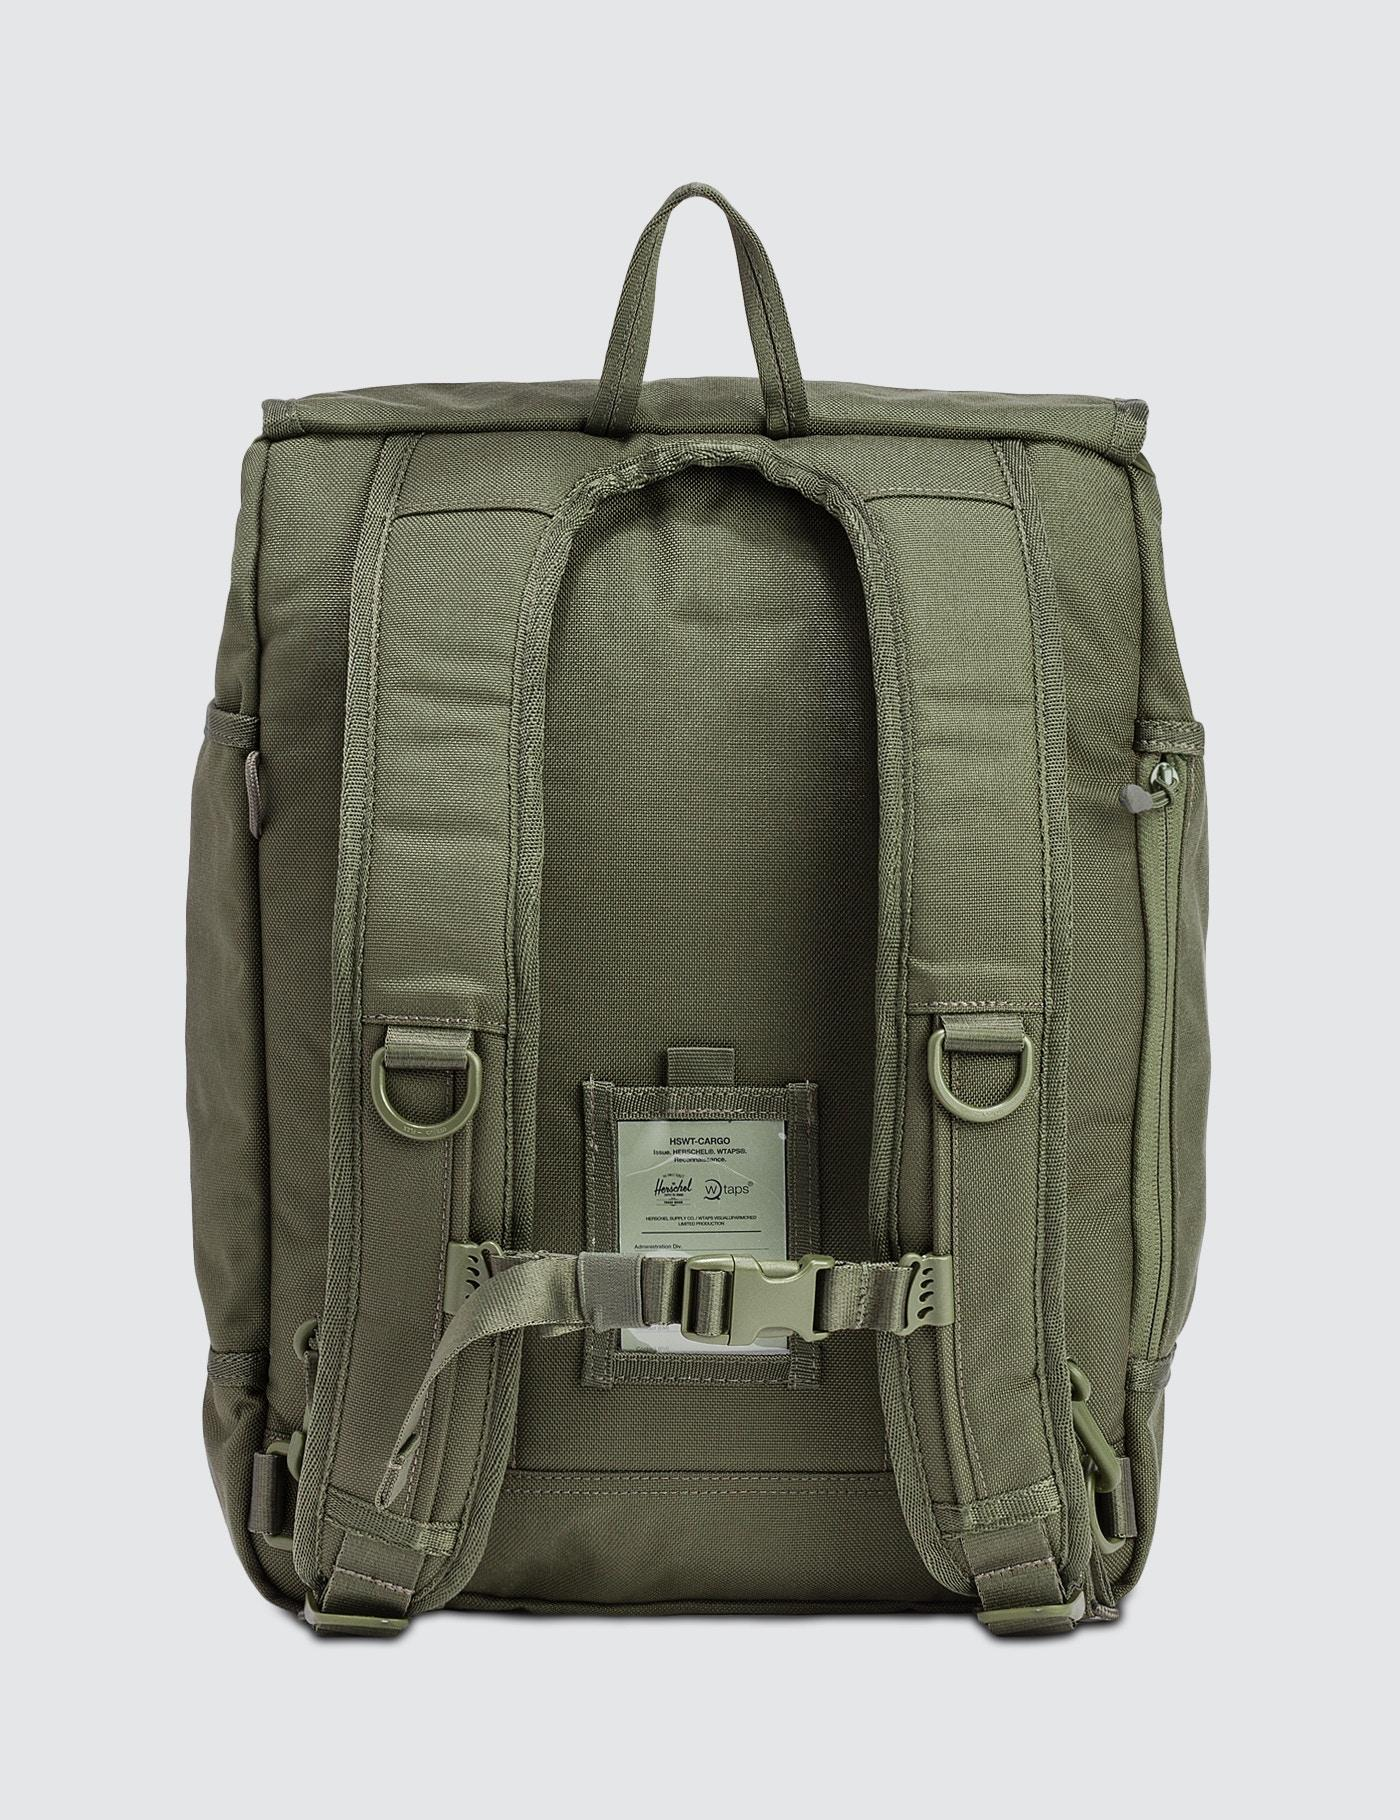 164d4251bee Herschel Supply Co. Wtaps X W-379 Backpack in Green for Men - Lyst